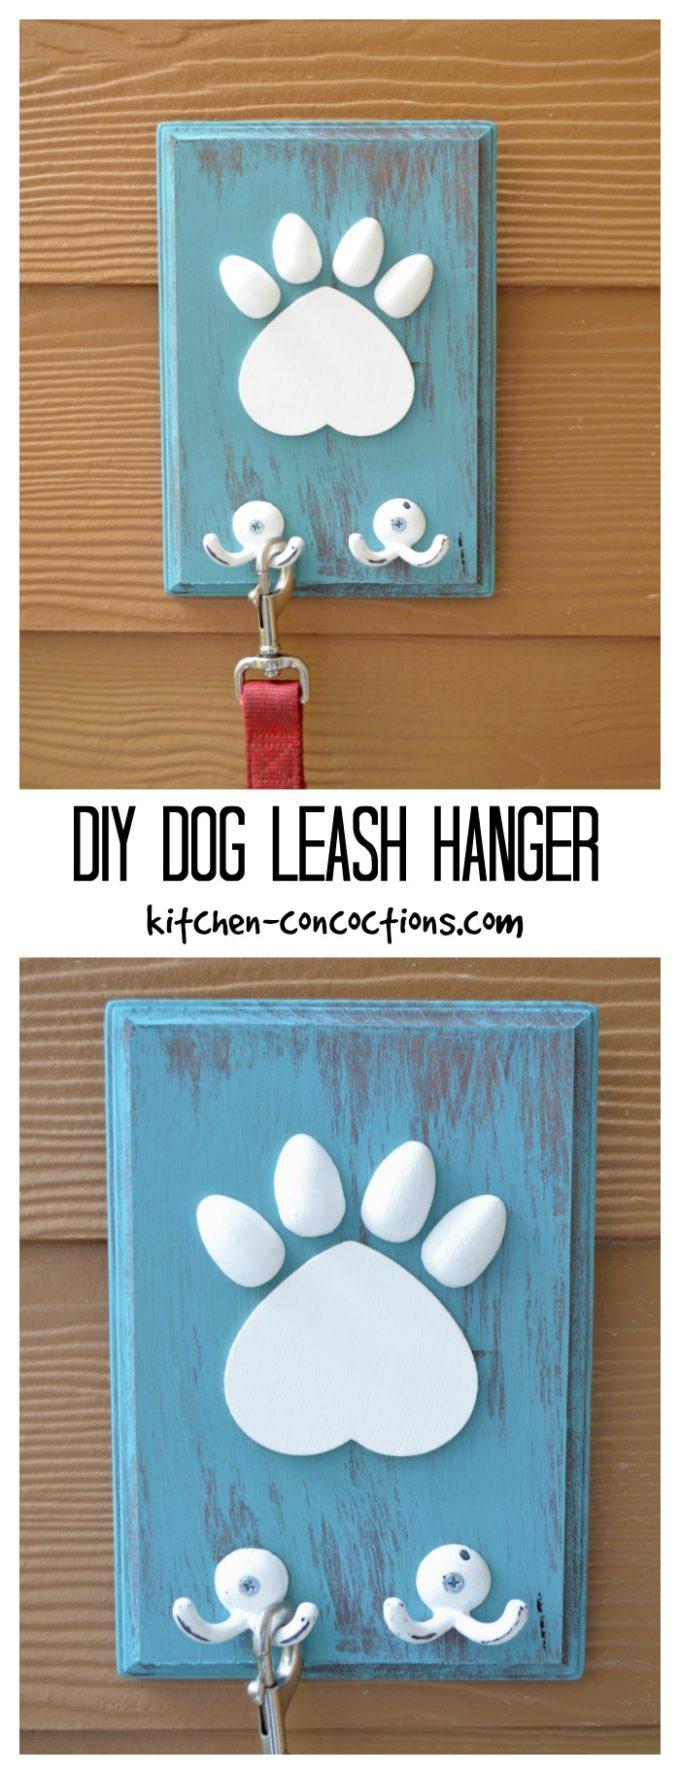 DIY Dog Leash Hanger